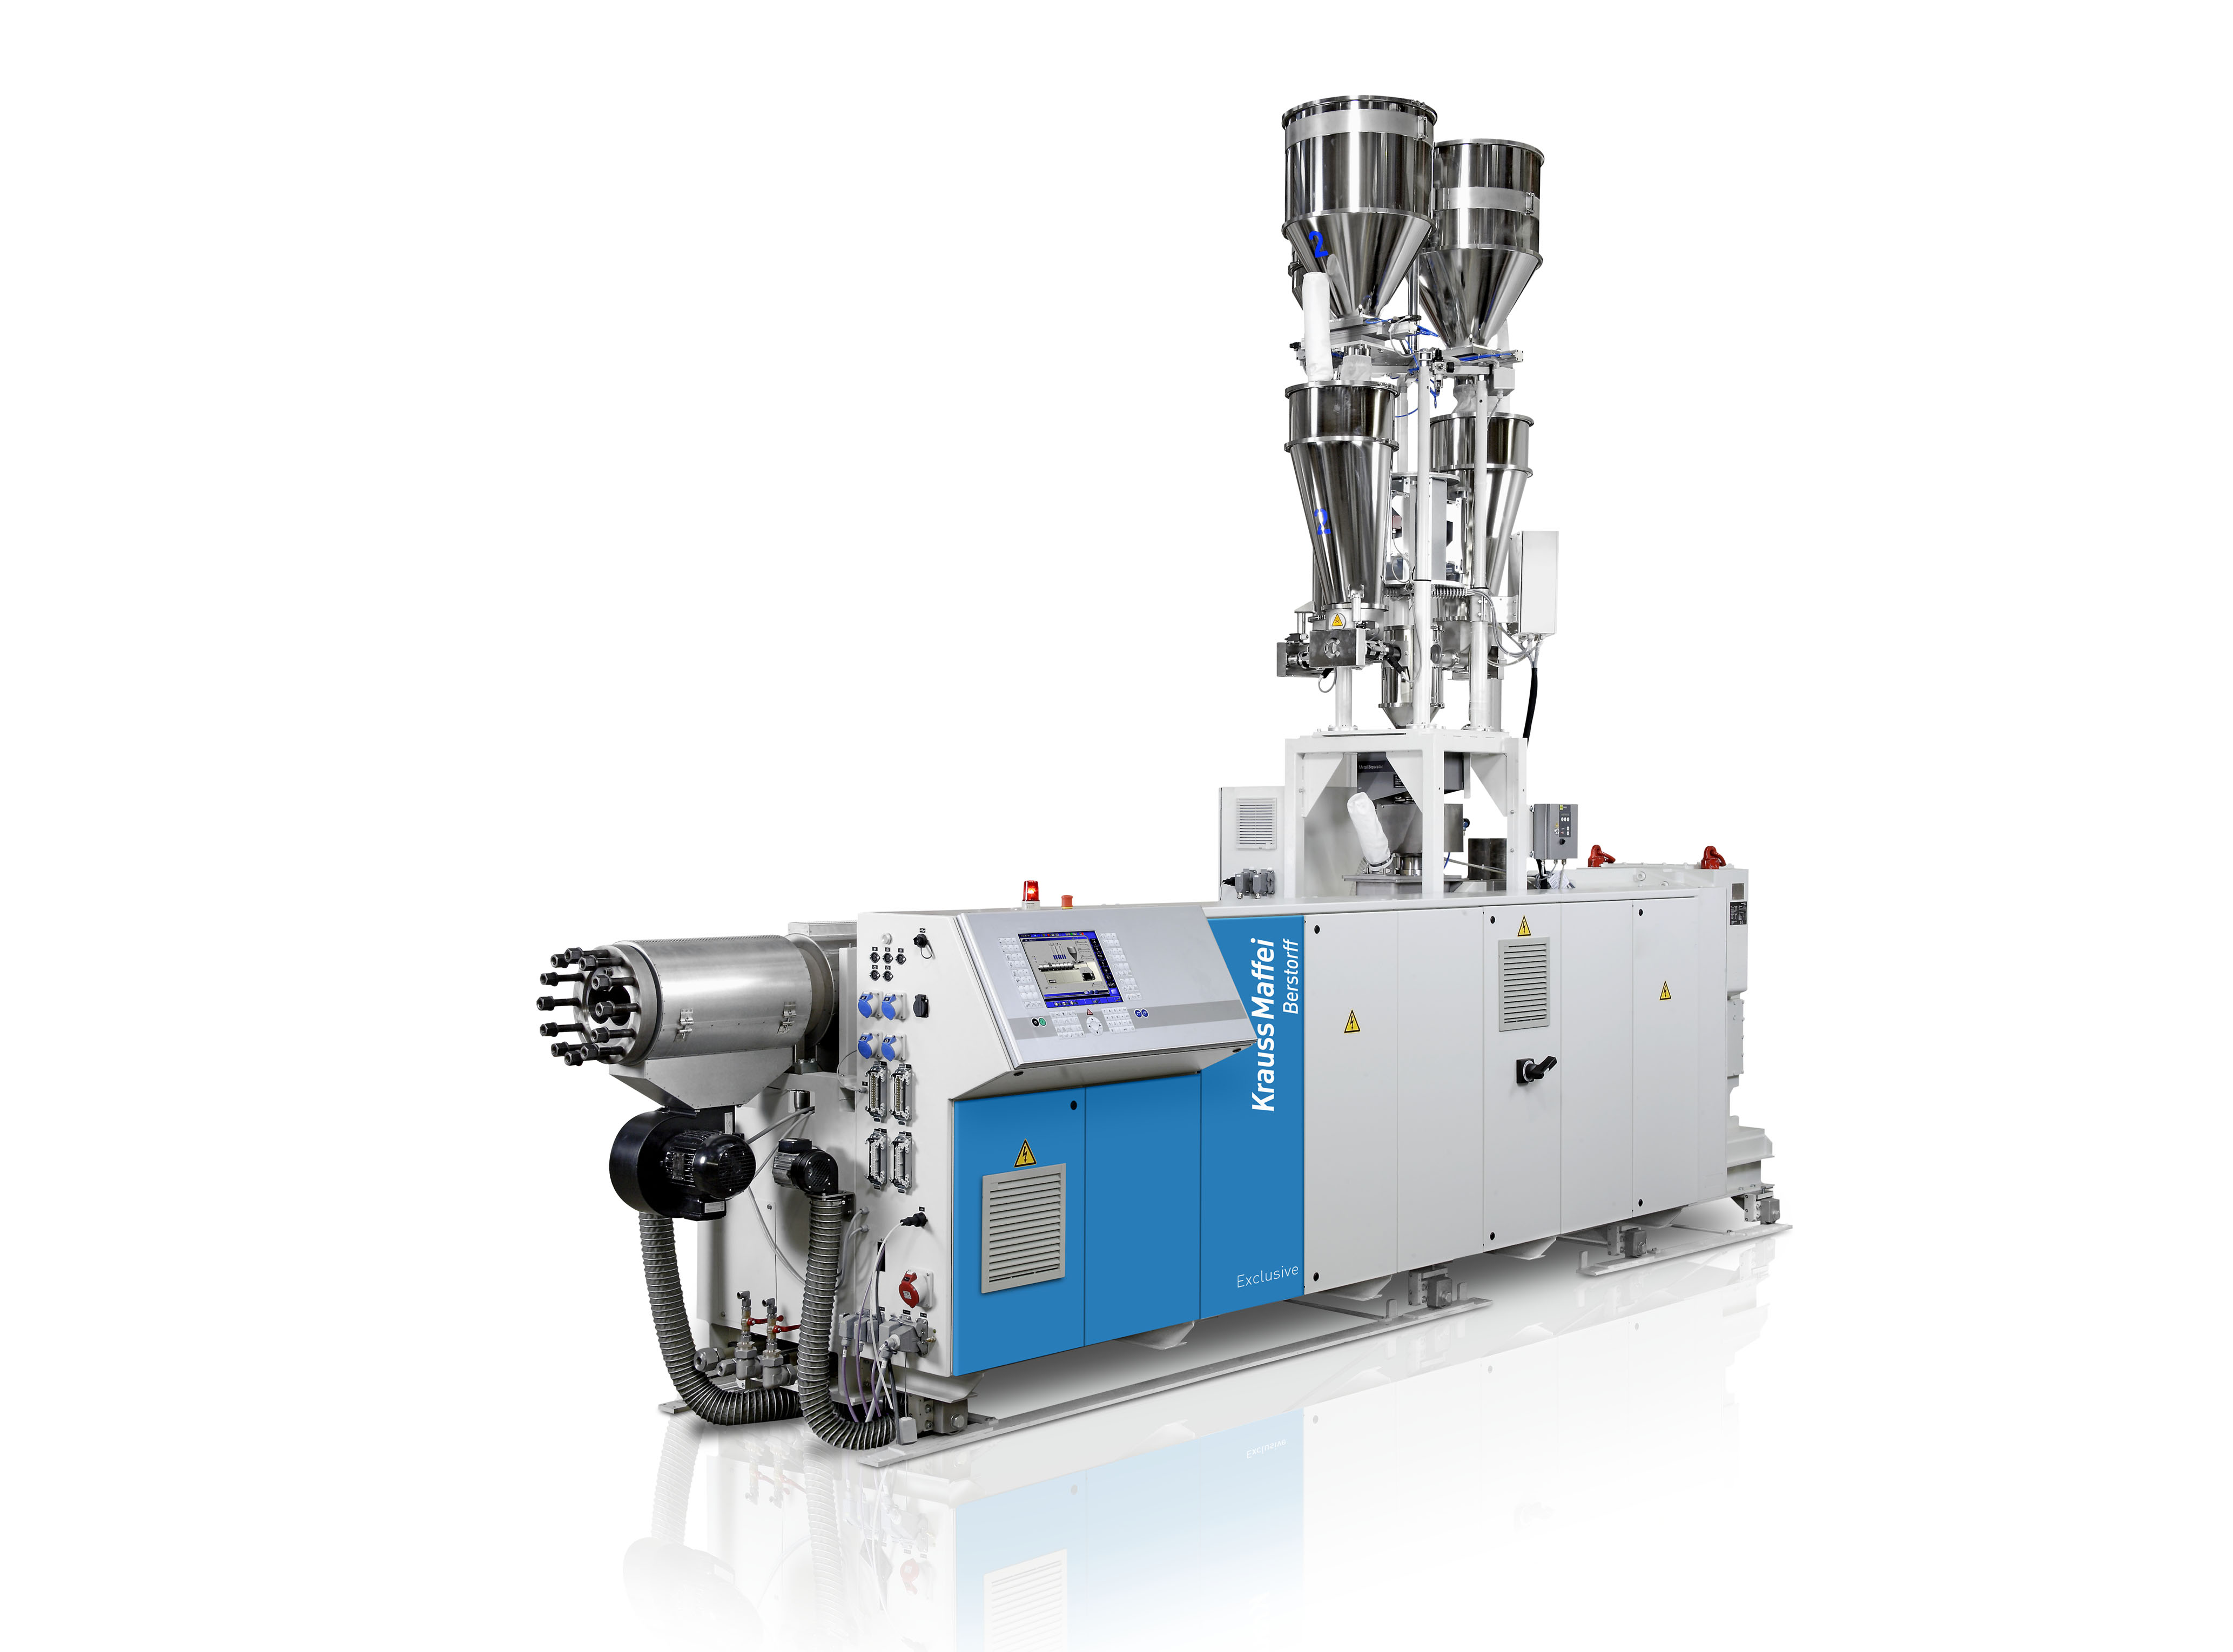 Palram Israel installs KraussMaffei Berstorff's flexible extrusion solution for PVC sheet production